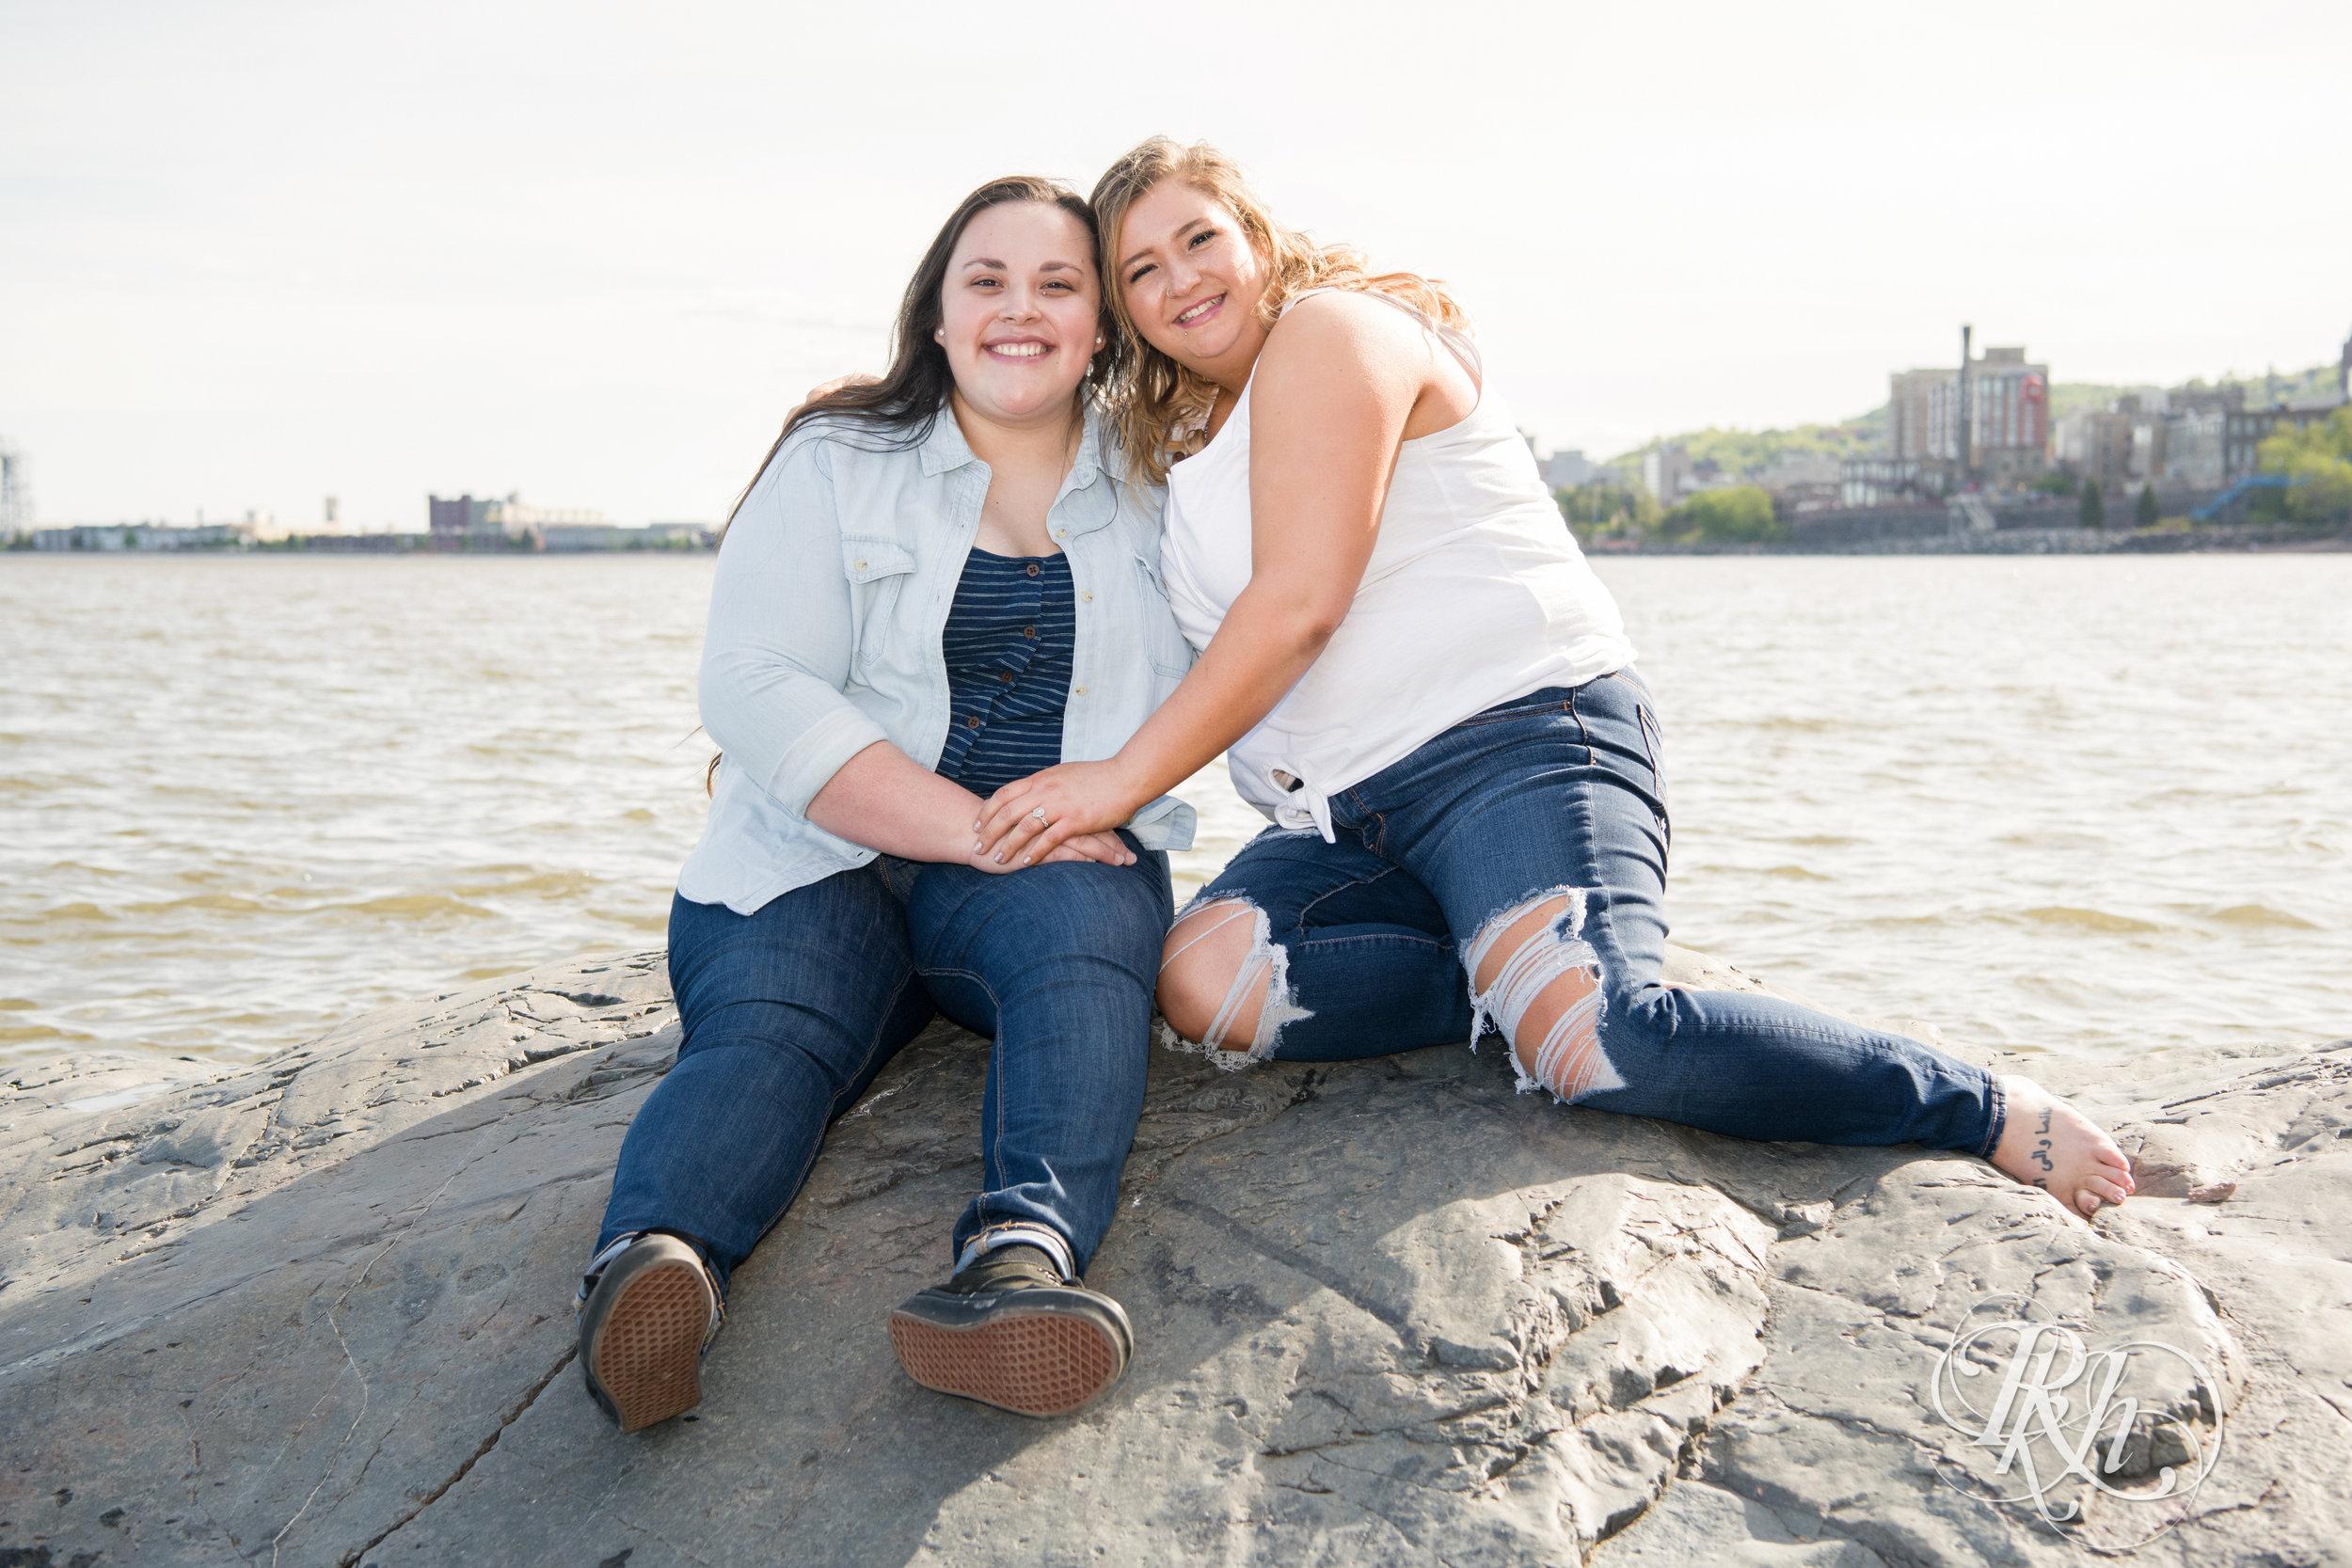 Rose and Yesenia - Minnesota Engagement Photography - Duluth - RKH Images - Blog (10 of 22).jpg